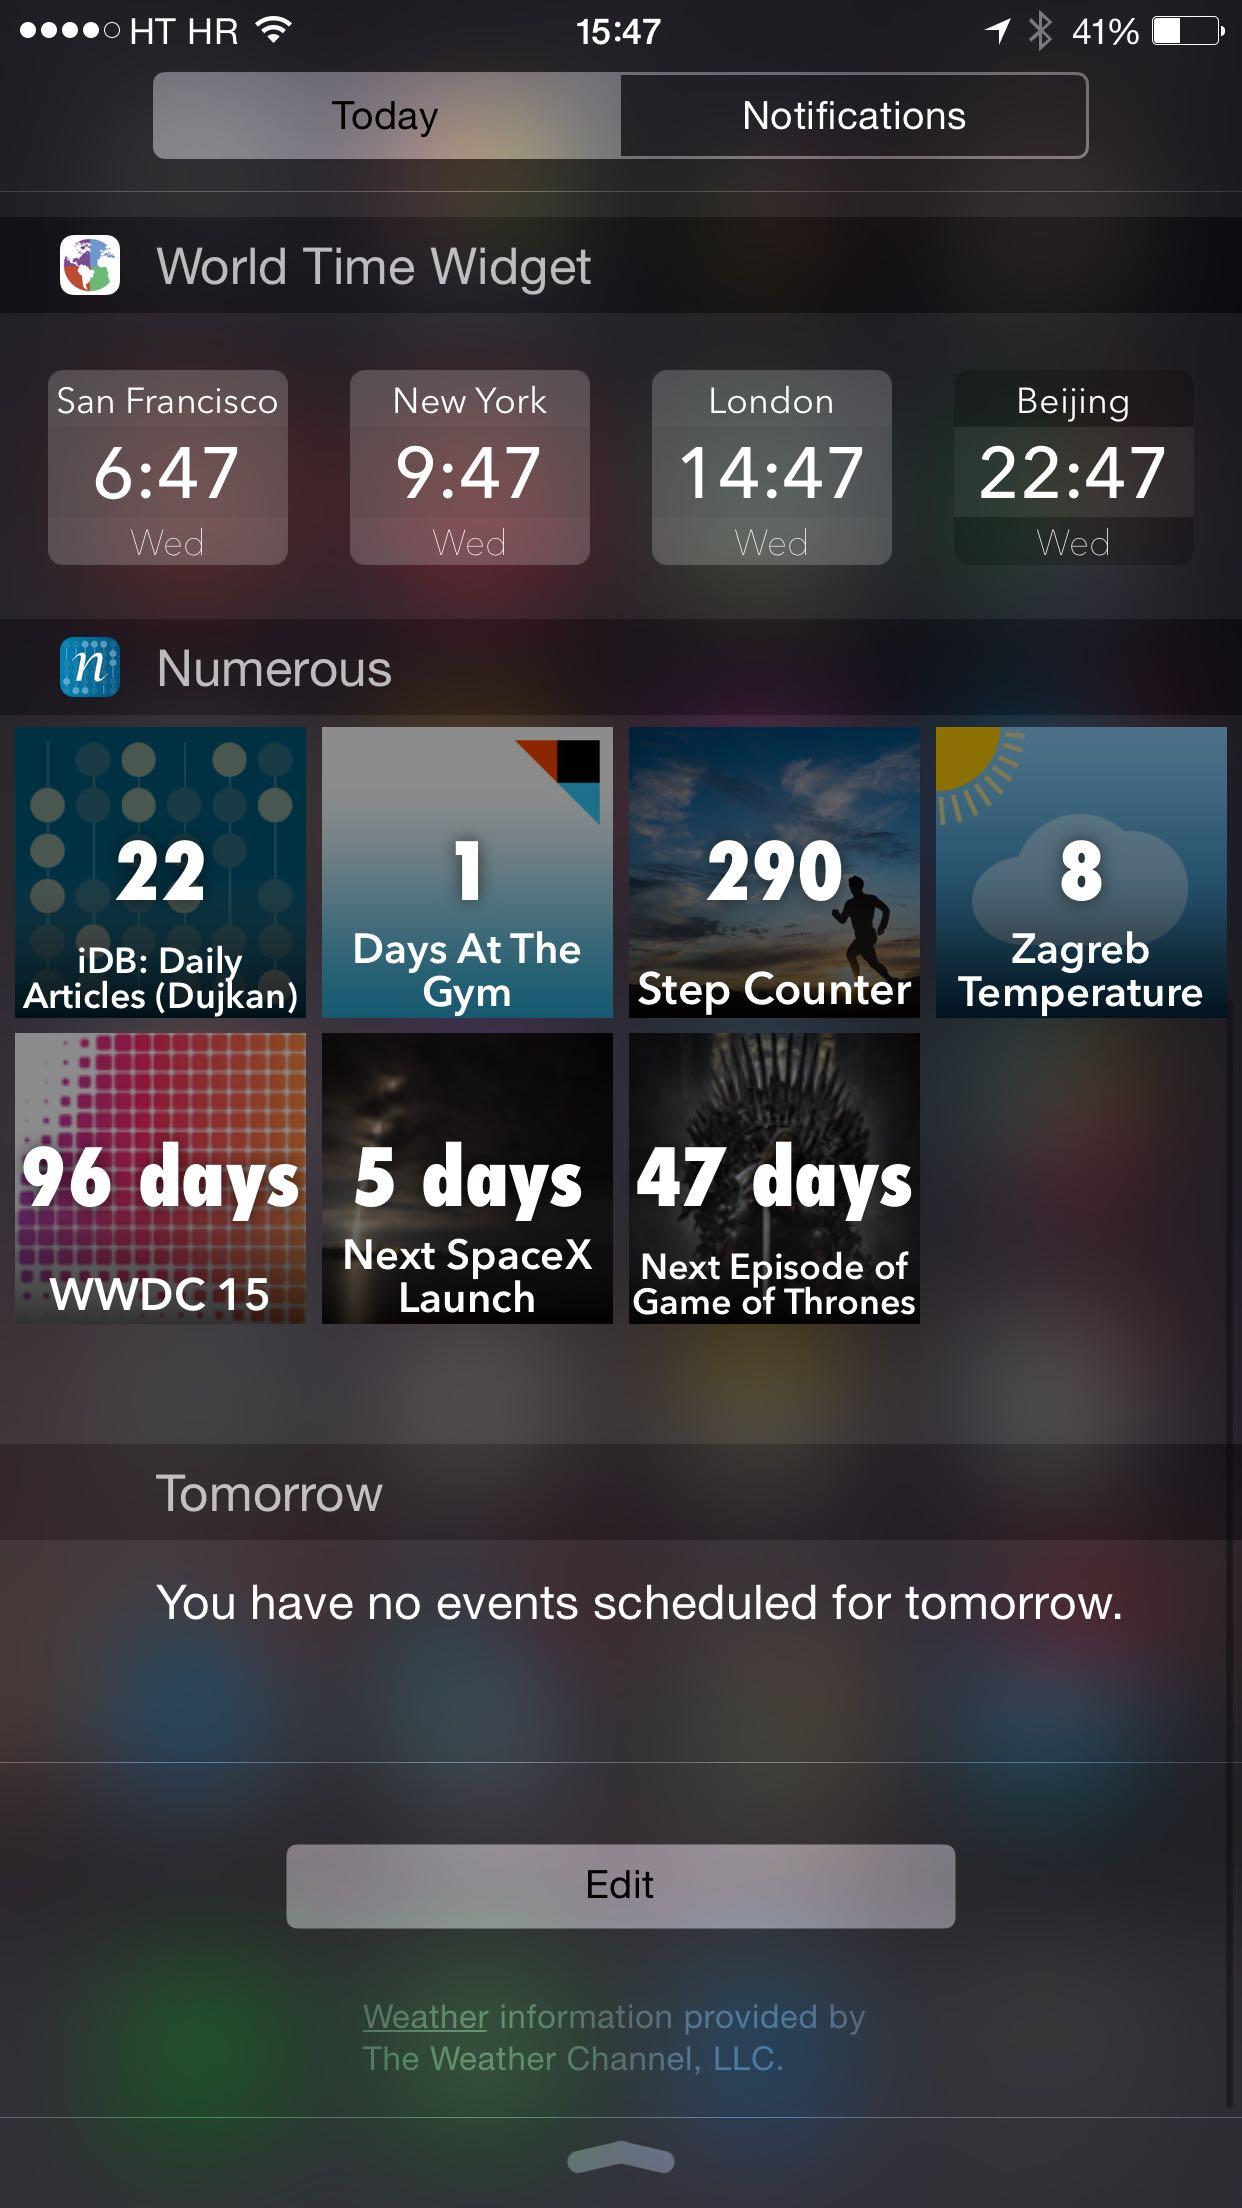 Numerous 2.2 for iOS Today widget